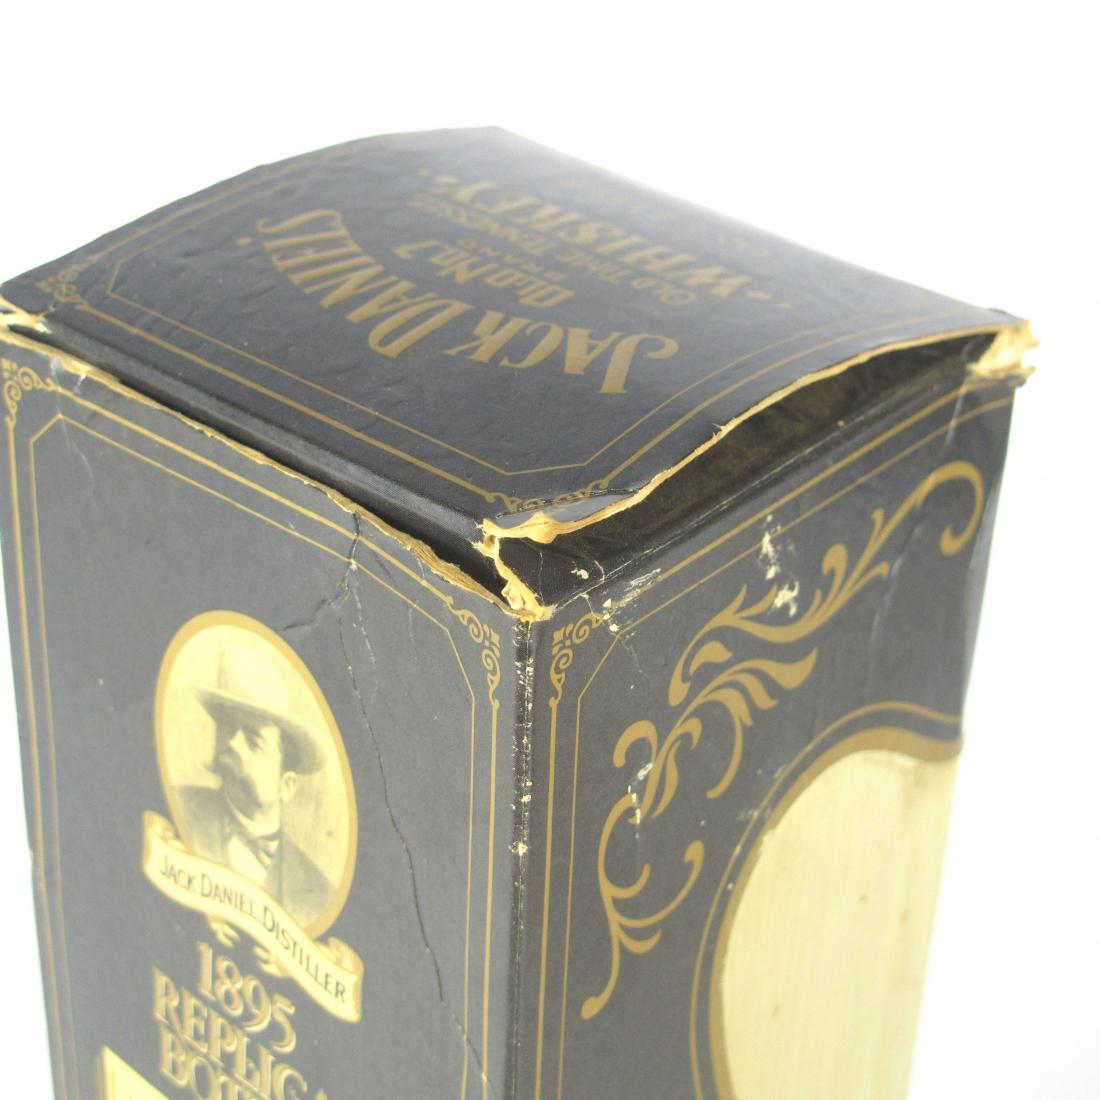 Jack Daniel's Old No.7 Replica 1895 / 1 Litre